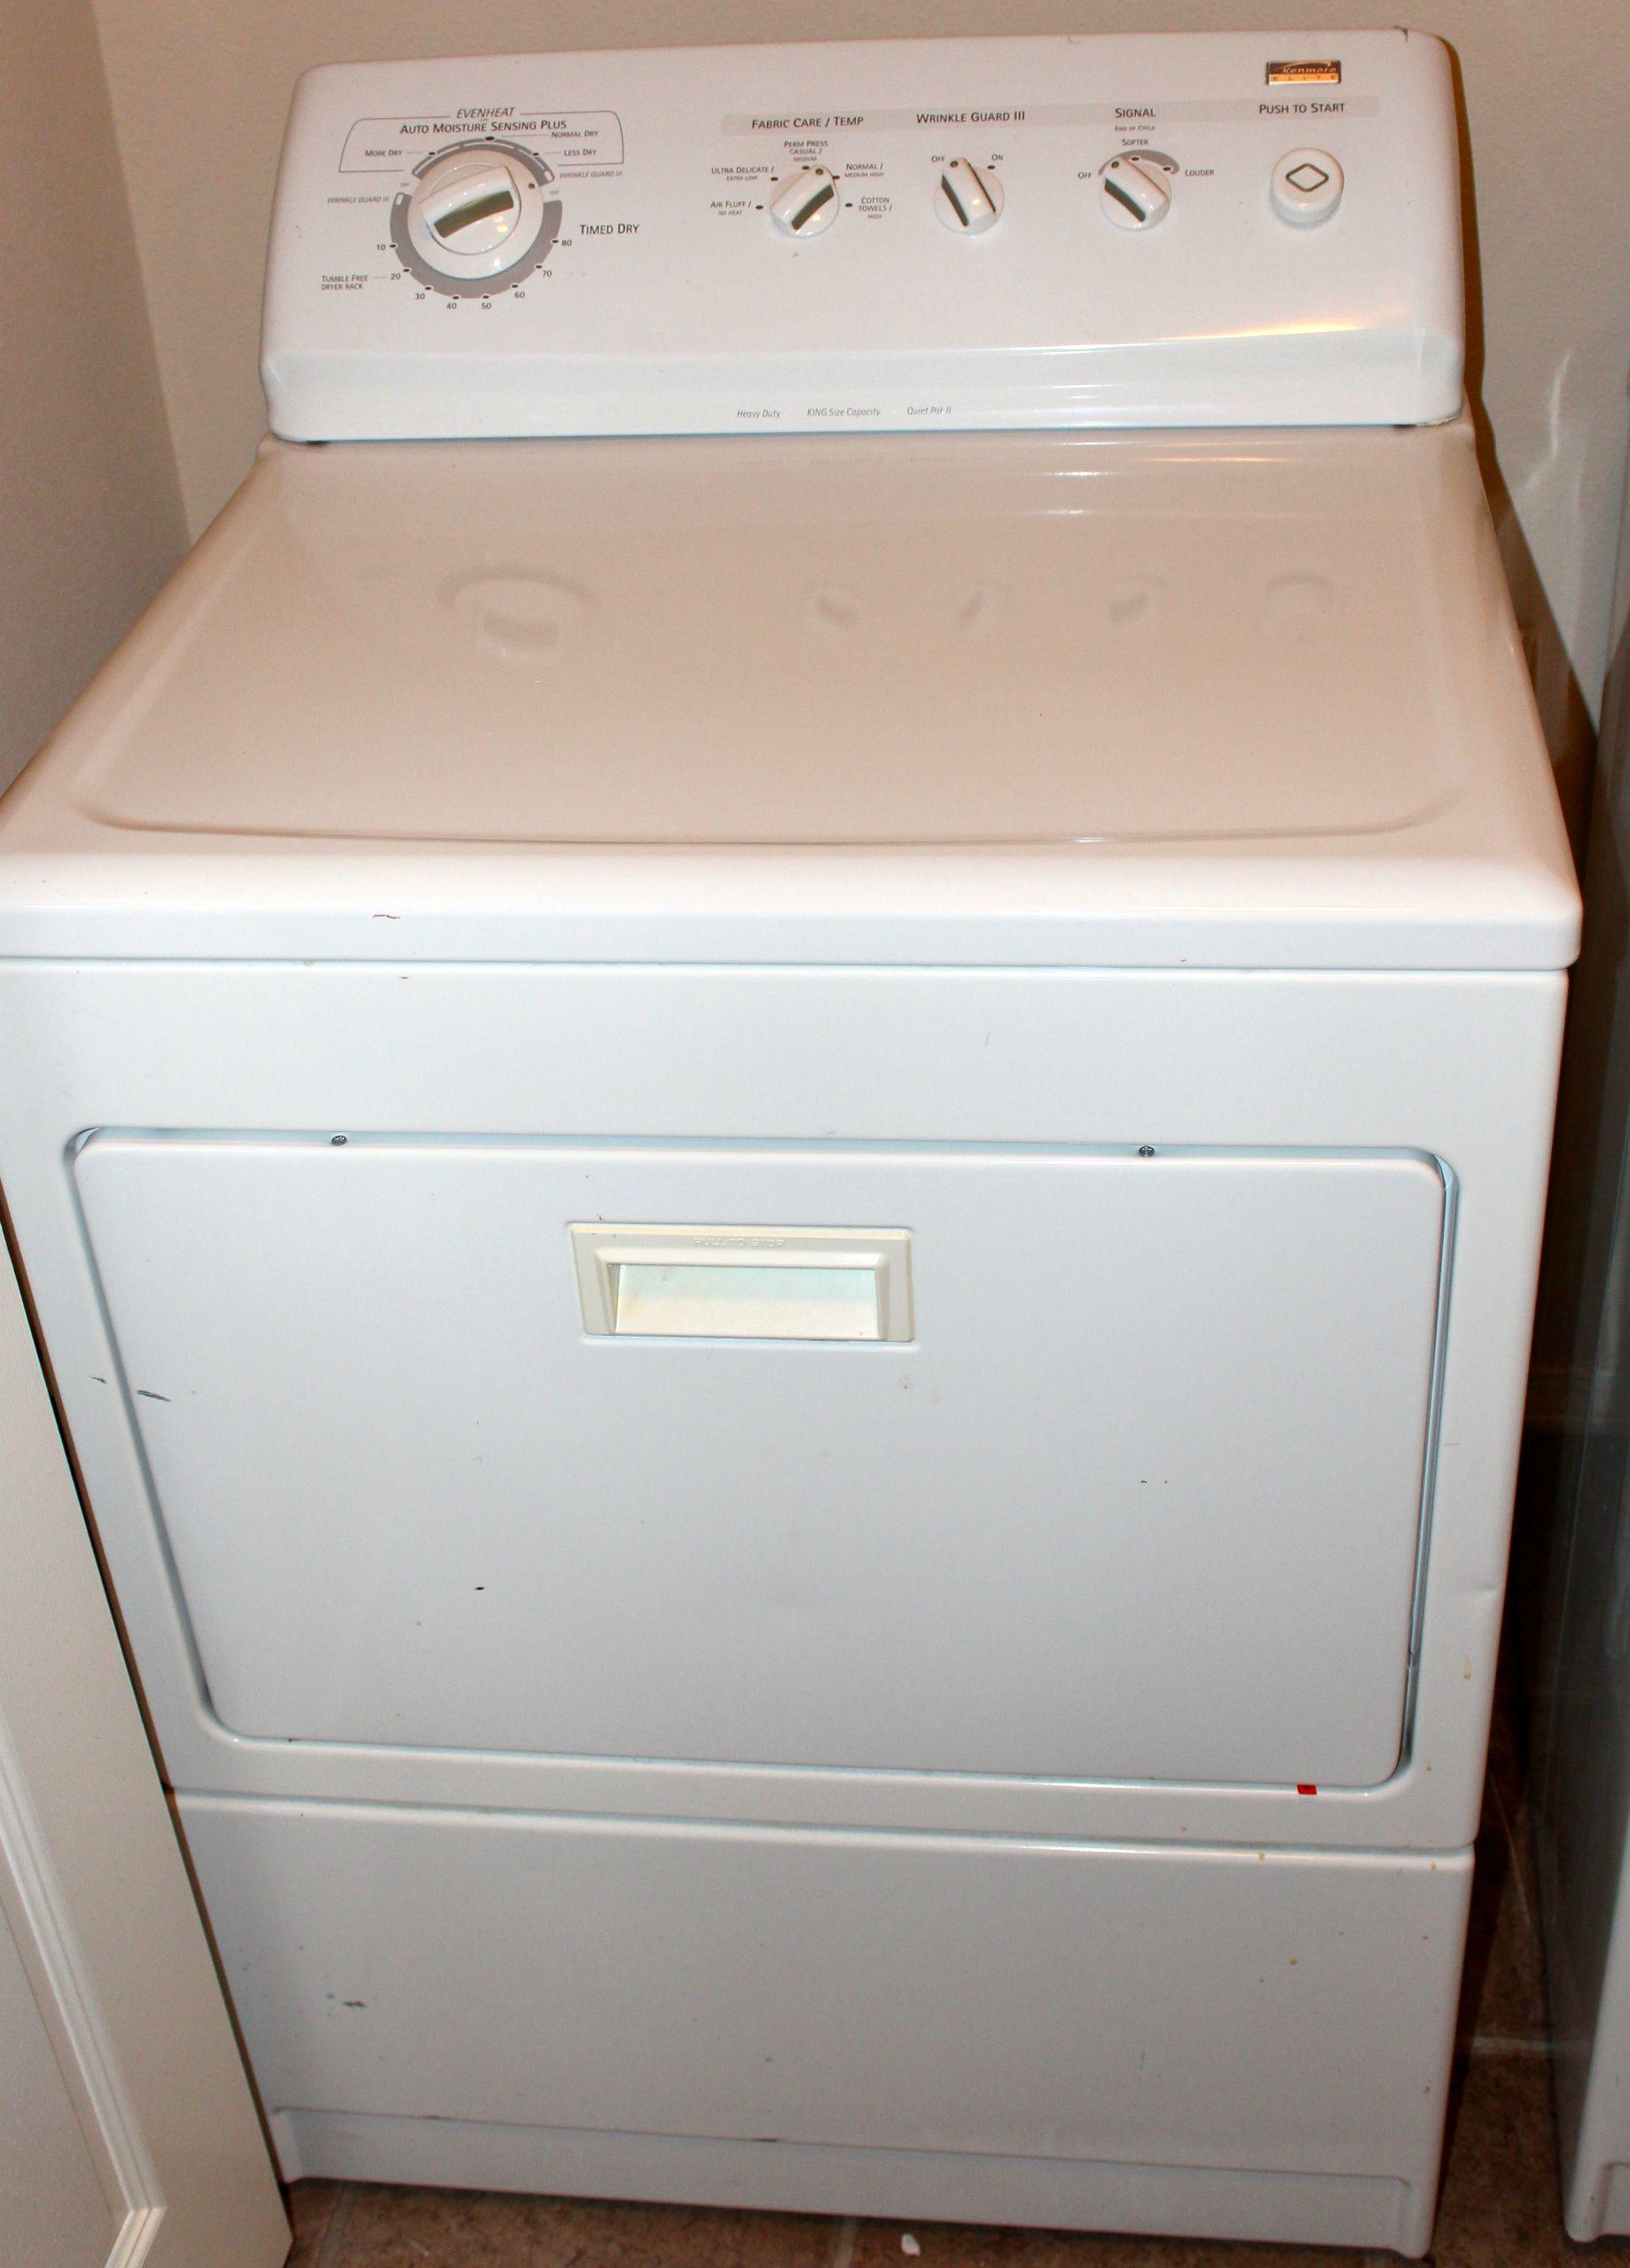 kenmore elite dryer. kenmore elite top load washer front dryer pair e